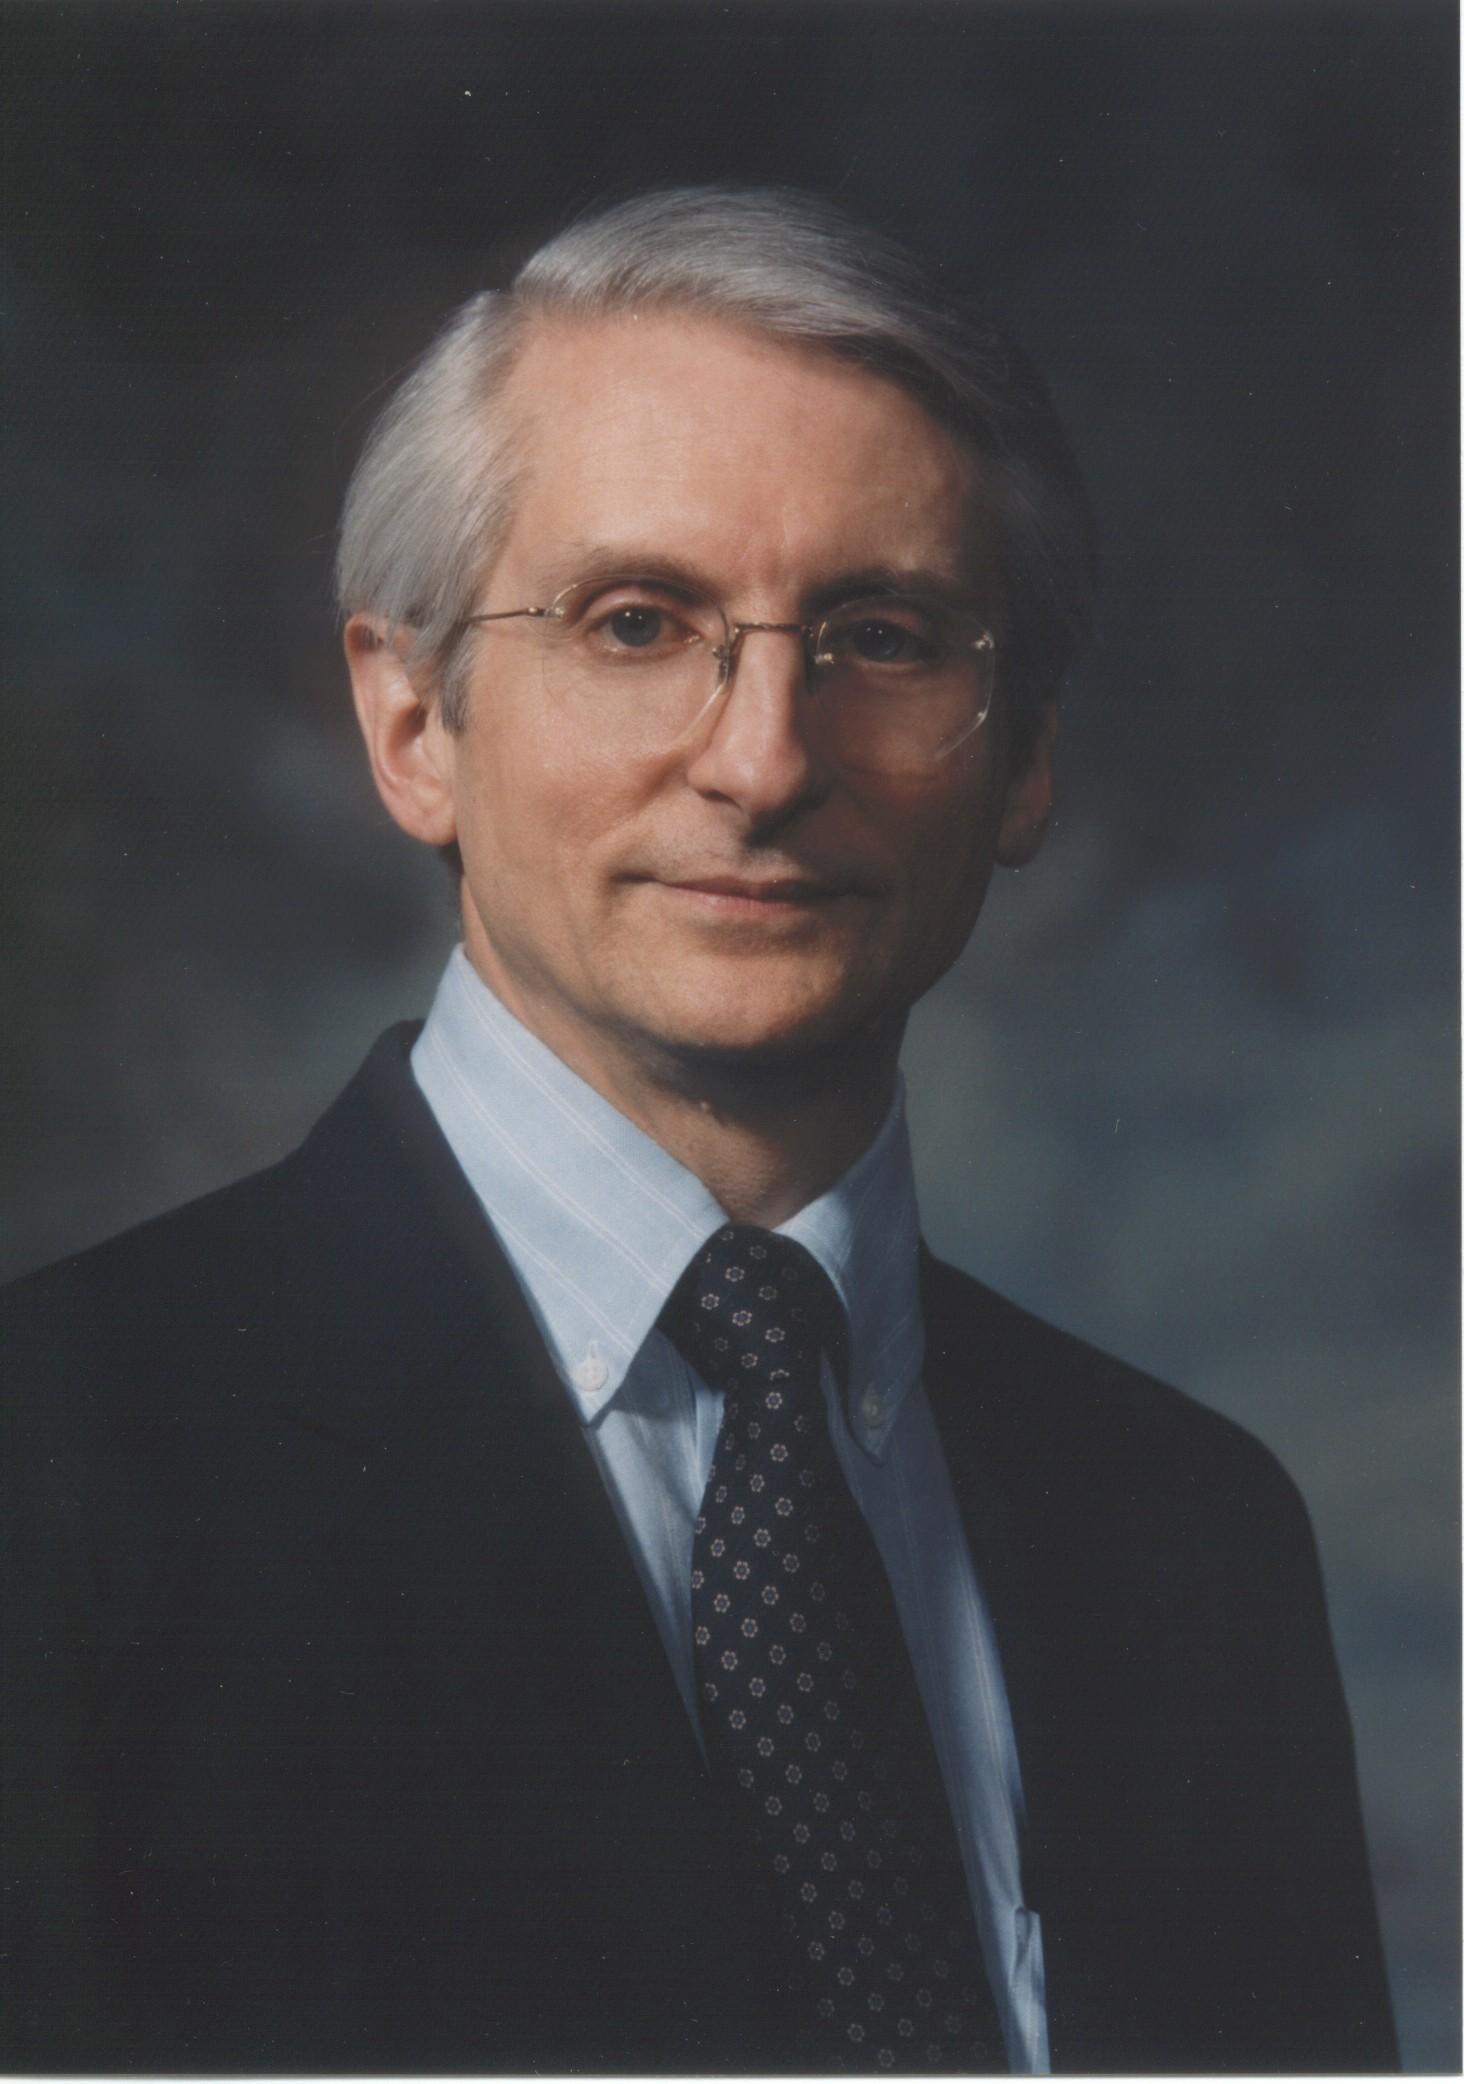 Peter Denning